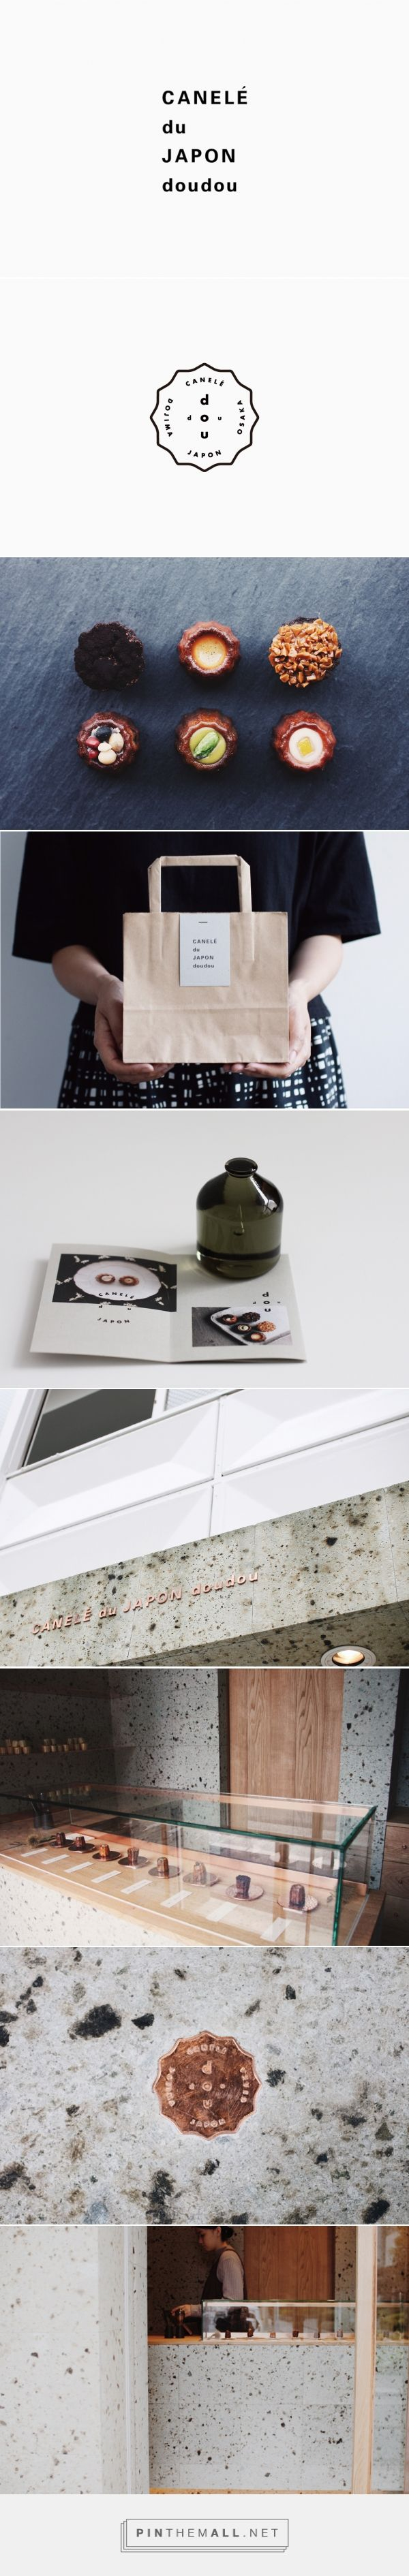 CANELÉ du JAPON doudou – 大阪のブランディングデザイン事務所 8otto - created via https://pinthemall.net